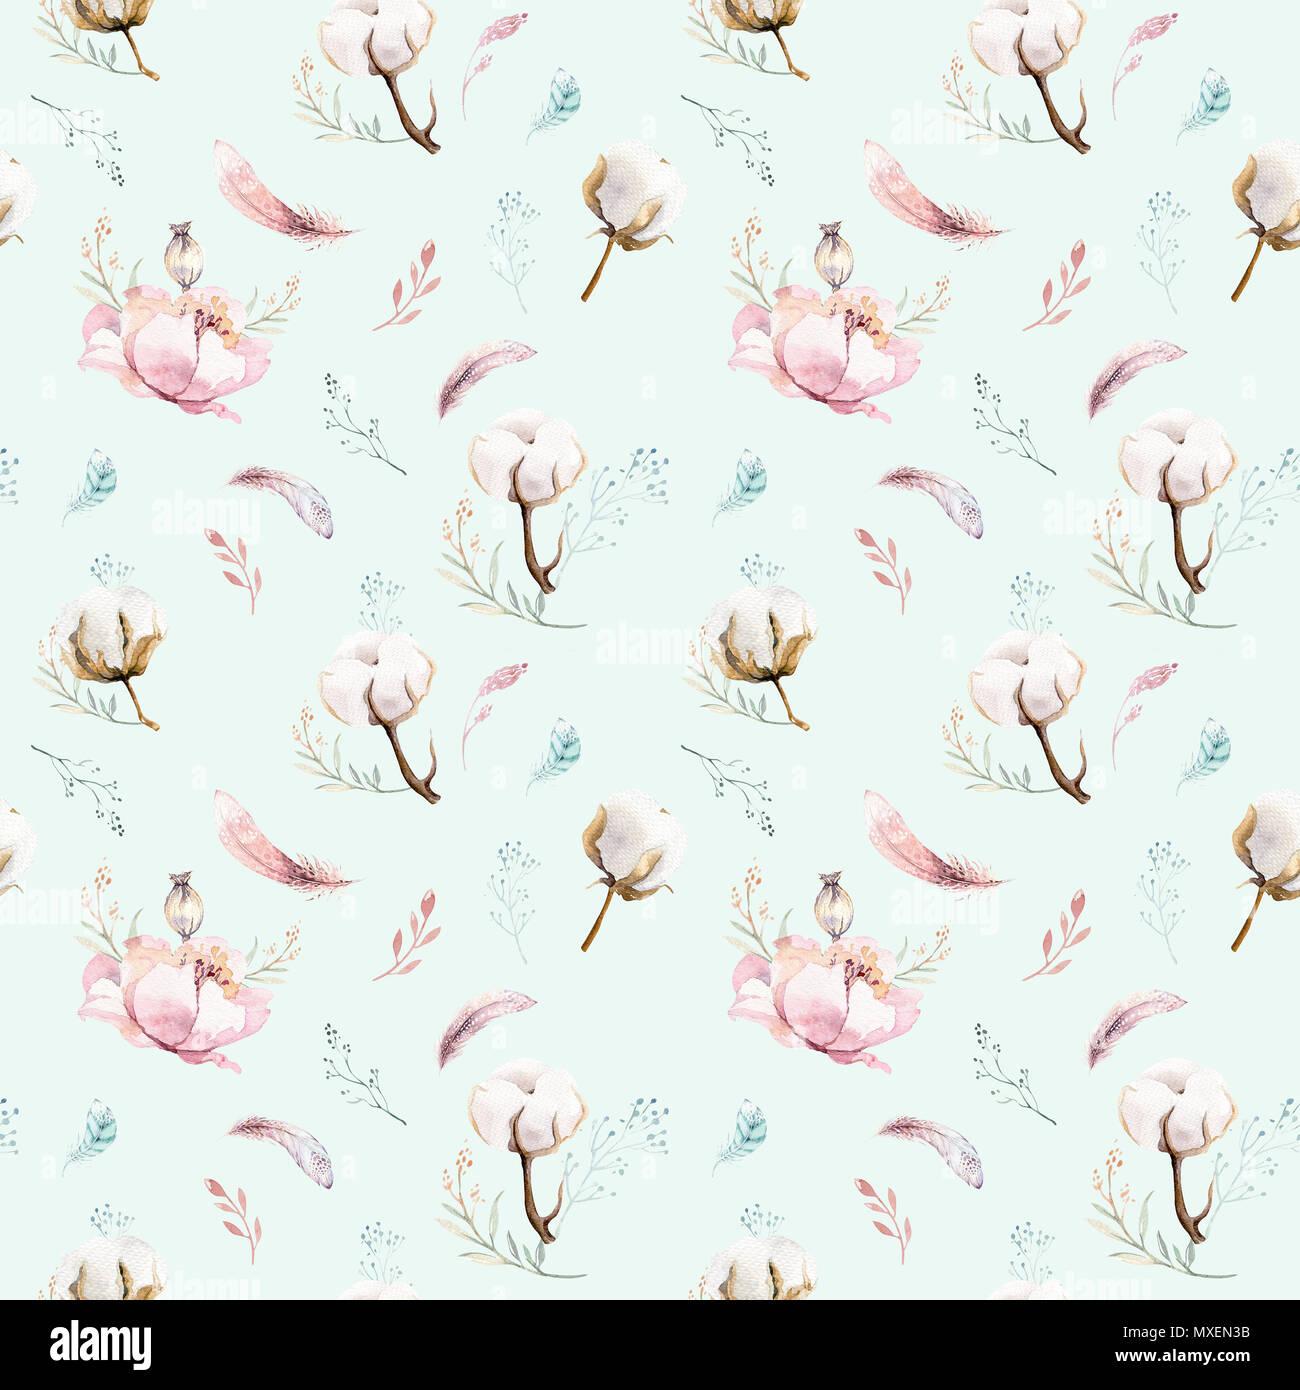 Cotton Wreath Imágenes De Stock & Cotton Wreath Fotos De Stock - Alamy